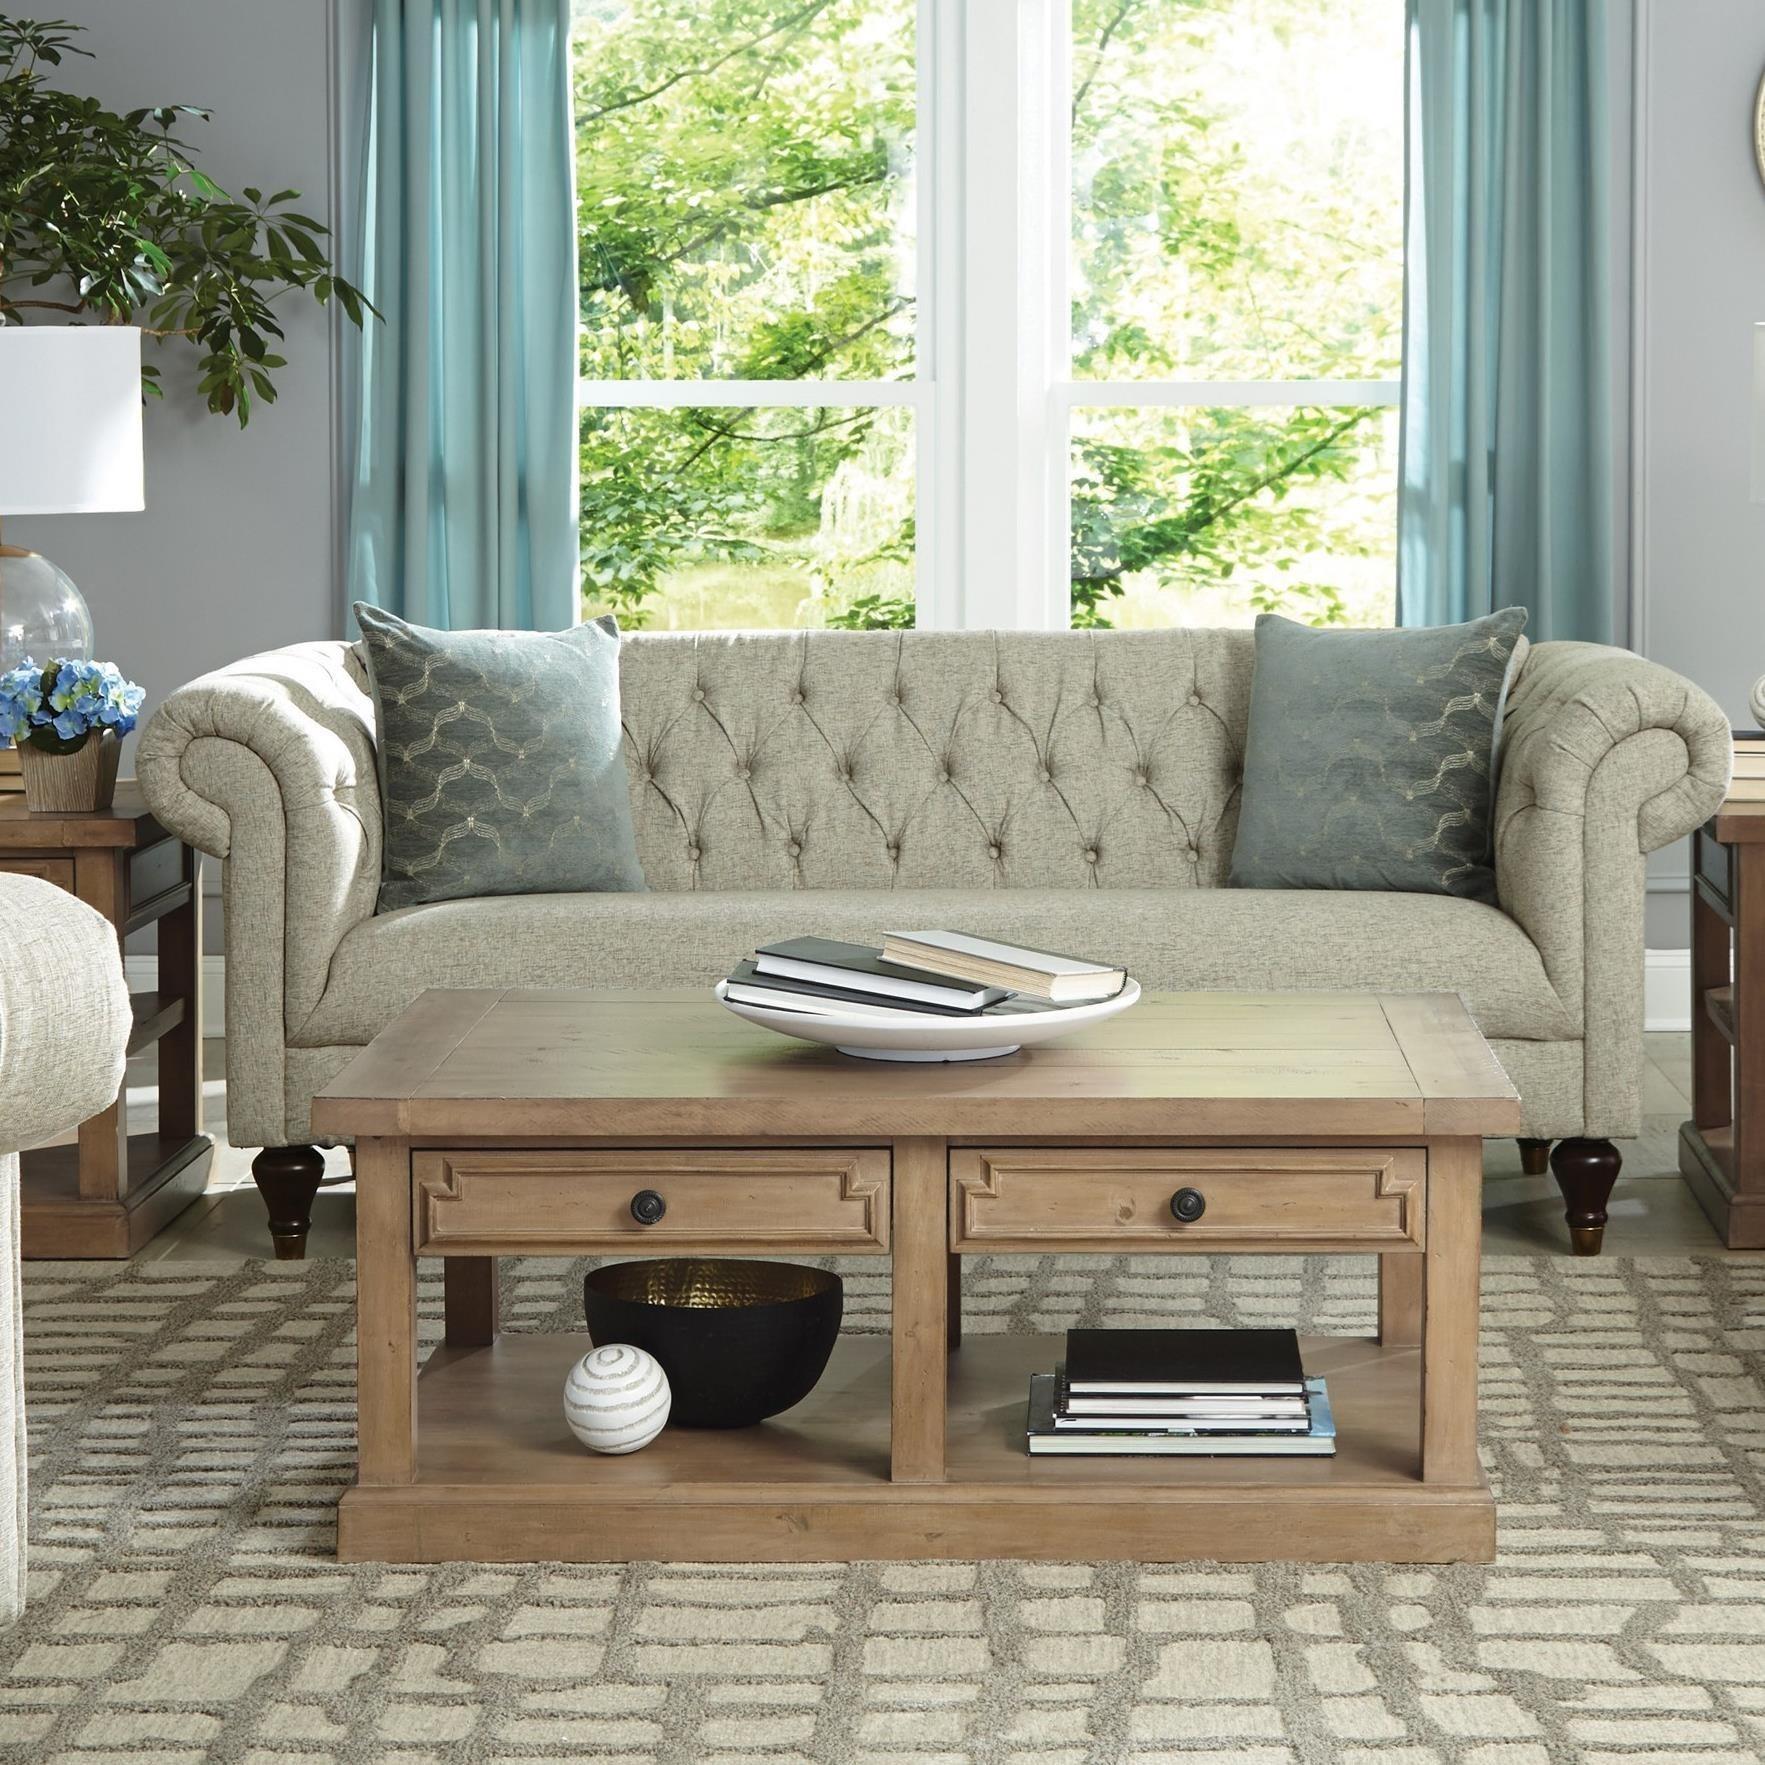 good Donny Osmond Sofa Part - 5: Donny Osmond Home G505550Sofa ...